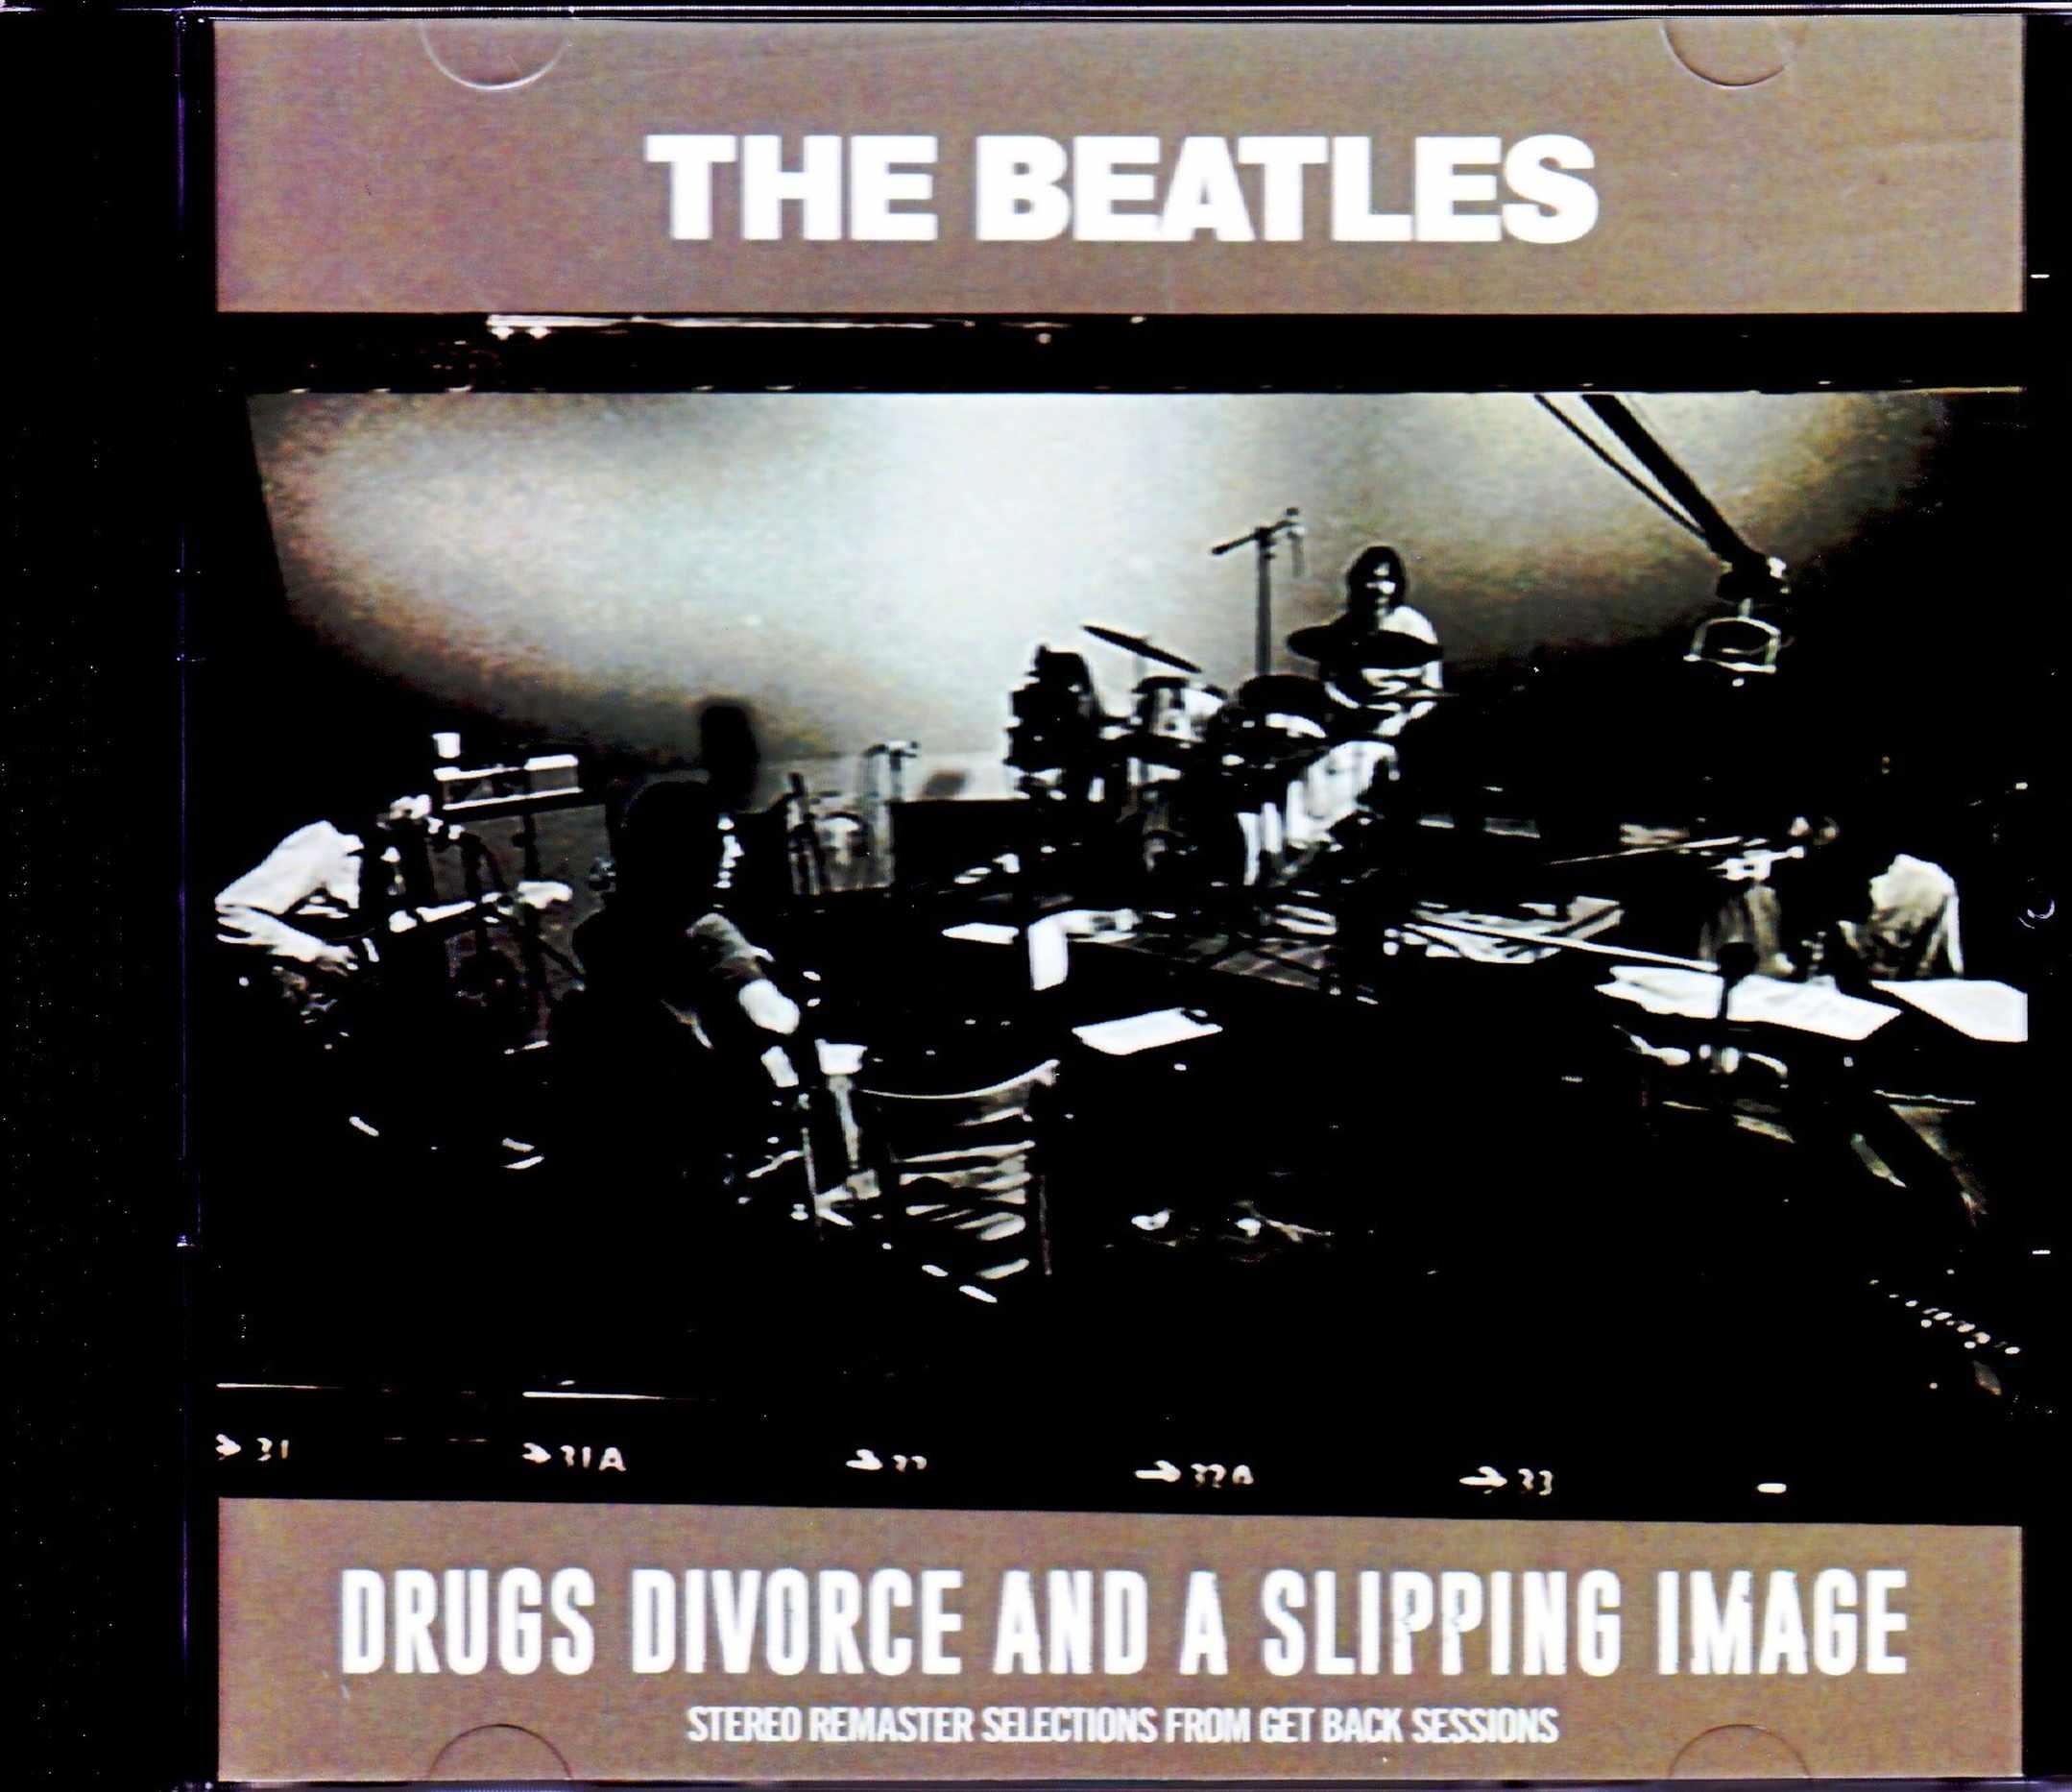 Beatles ビートルズ/ゲット・バック・セッション Get Back Session 1969 Stereo Remastered